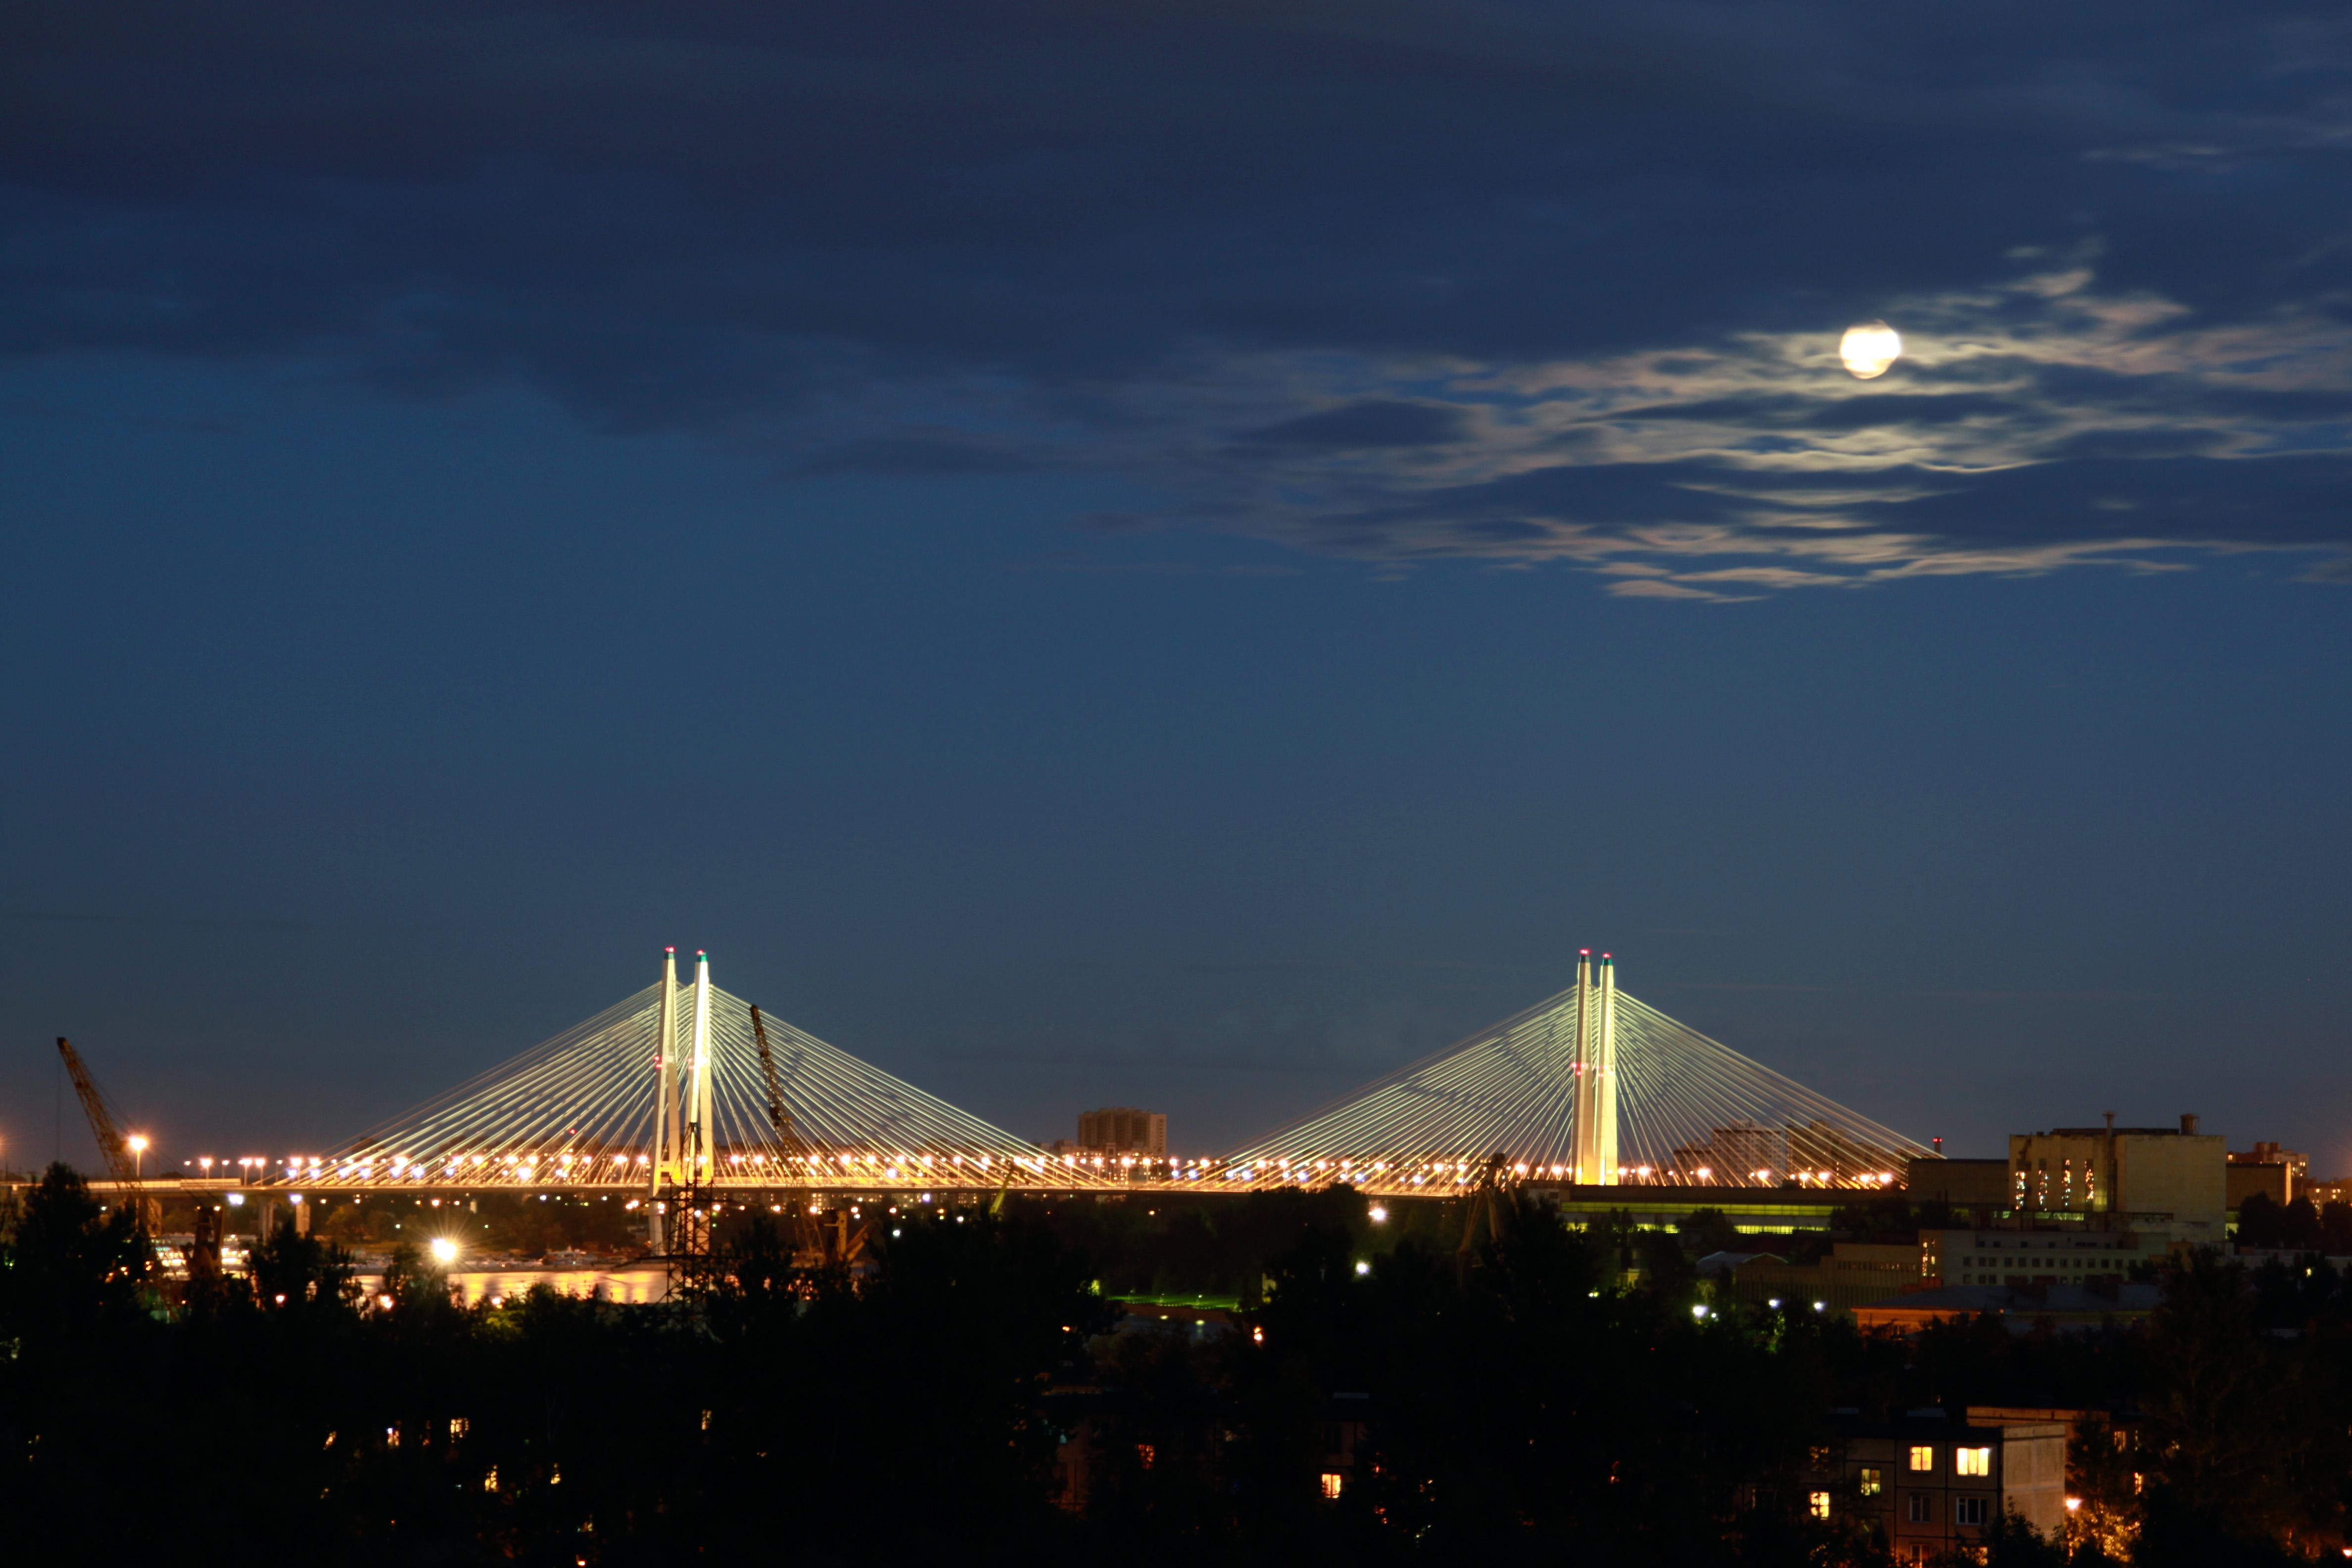 The first cable-stayed bridge of St. Petersburg - Bolshoy Obukhovsky Bridge